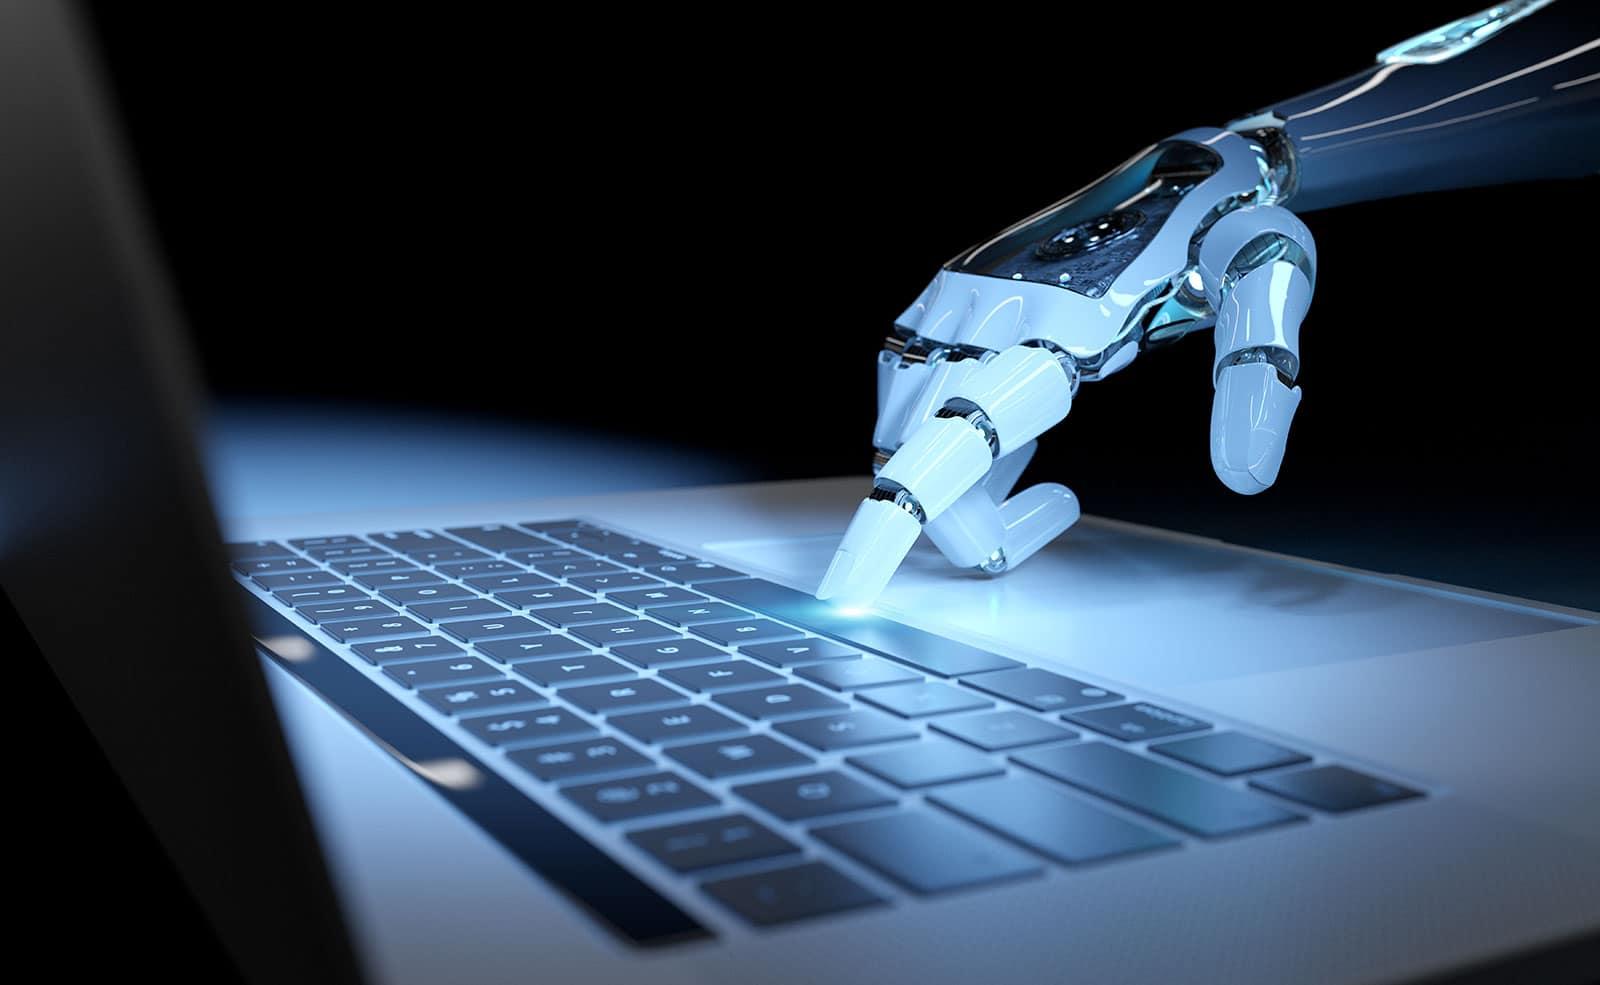 smeup machine learning per le aziende